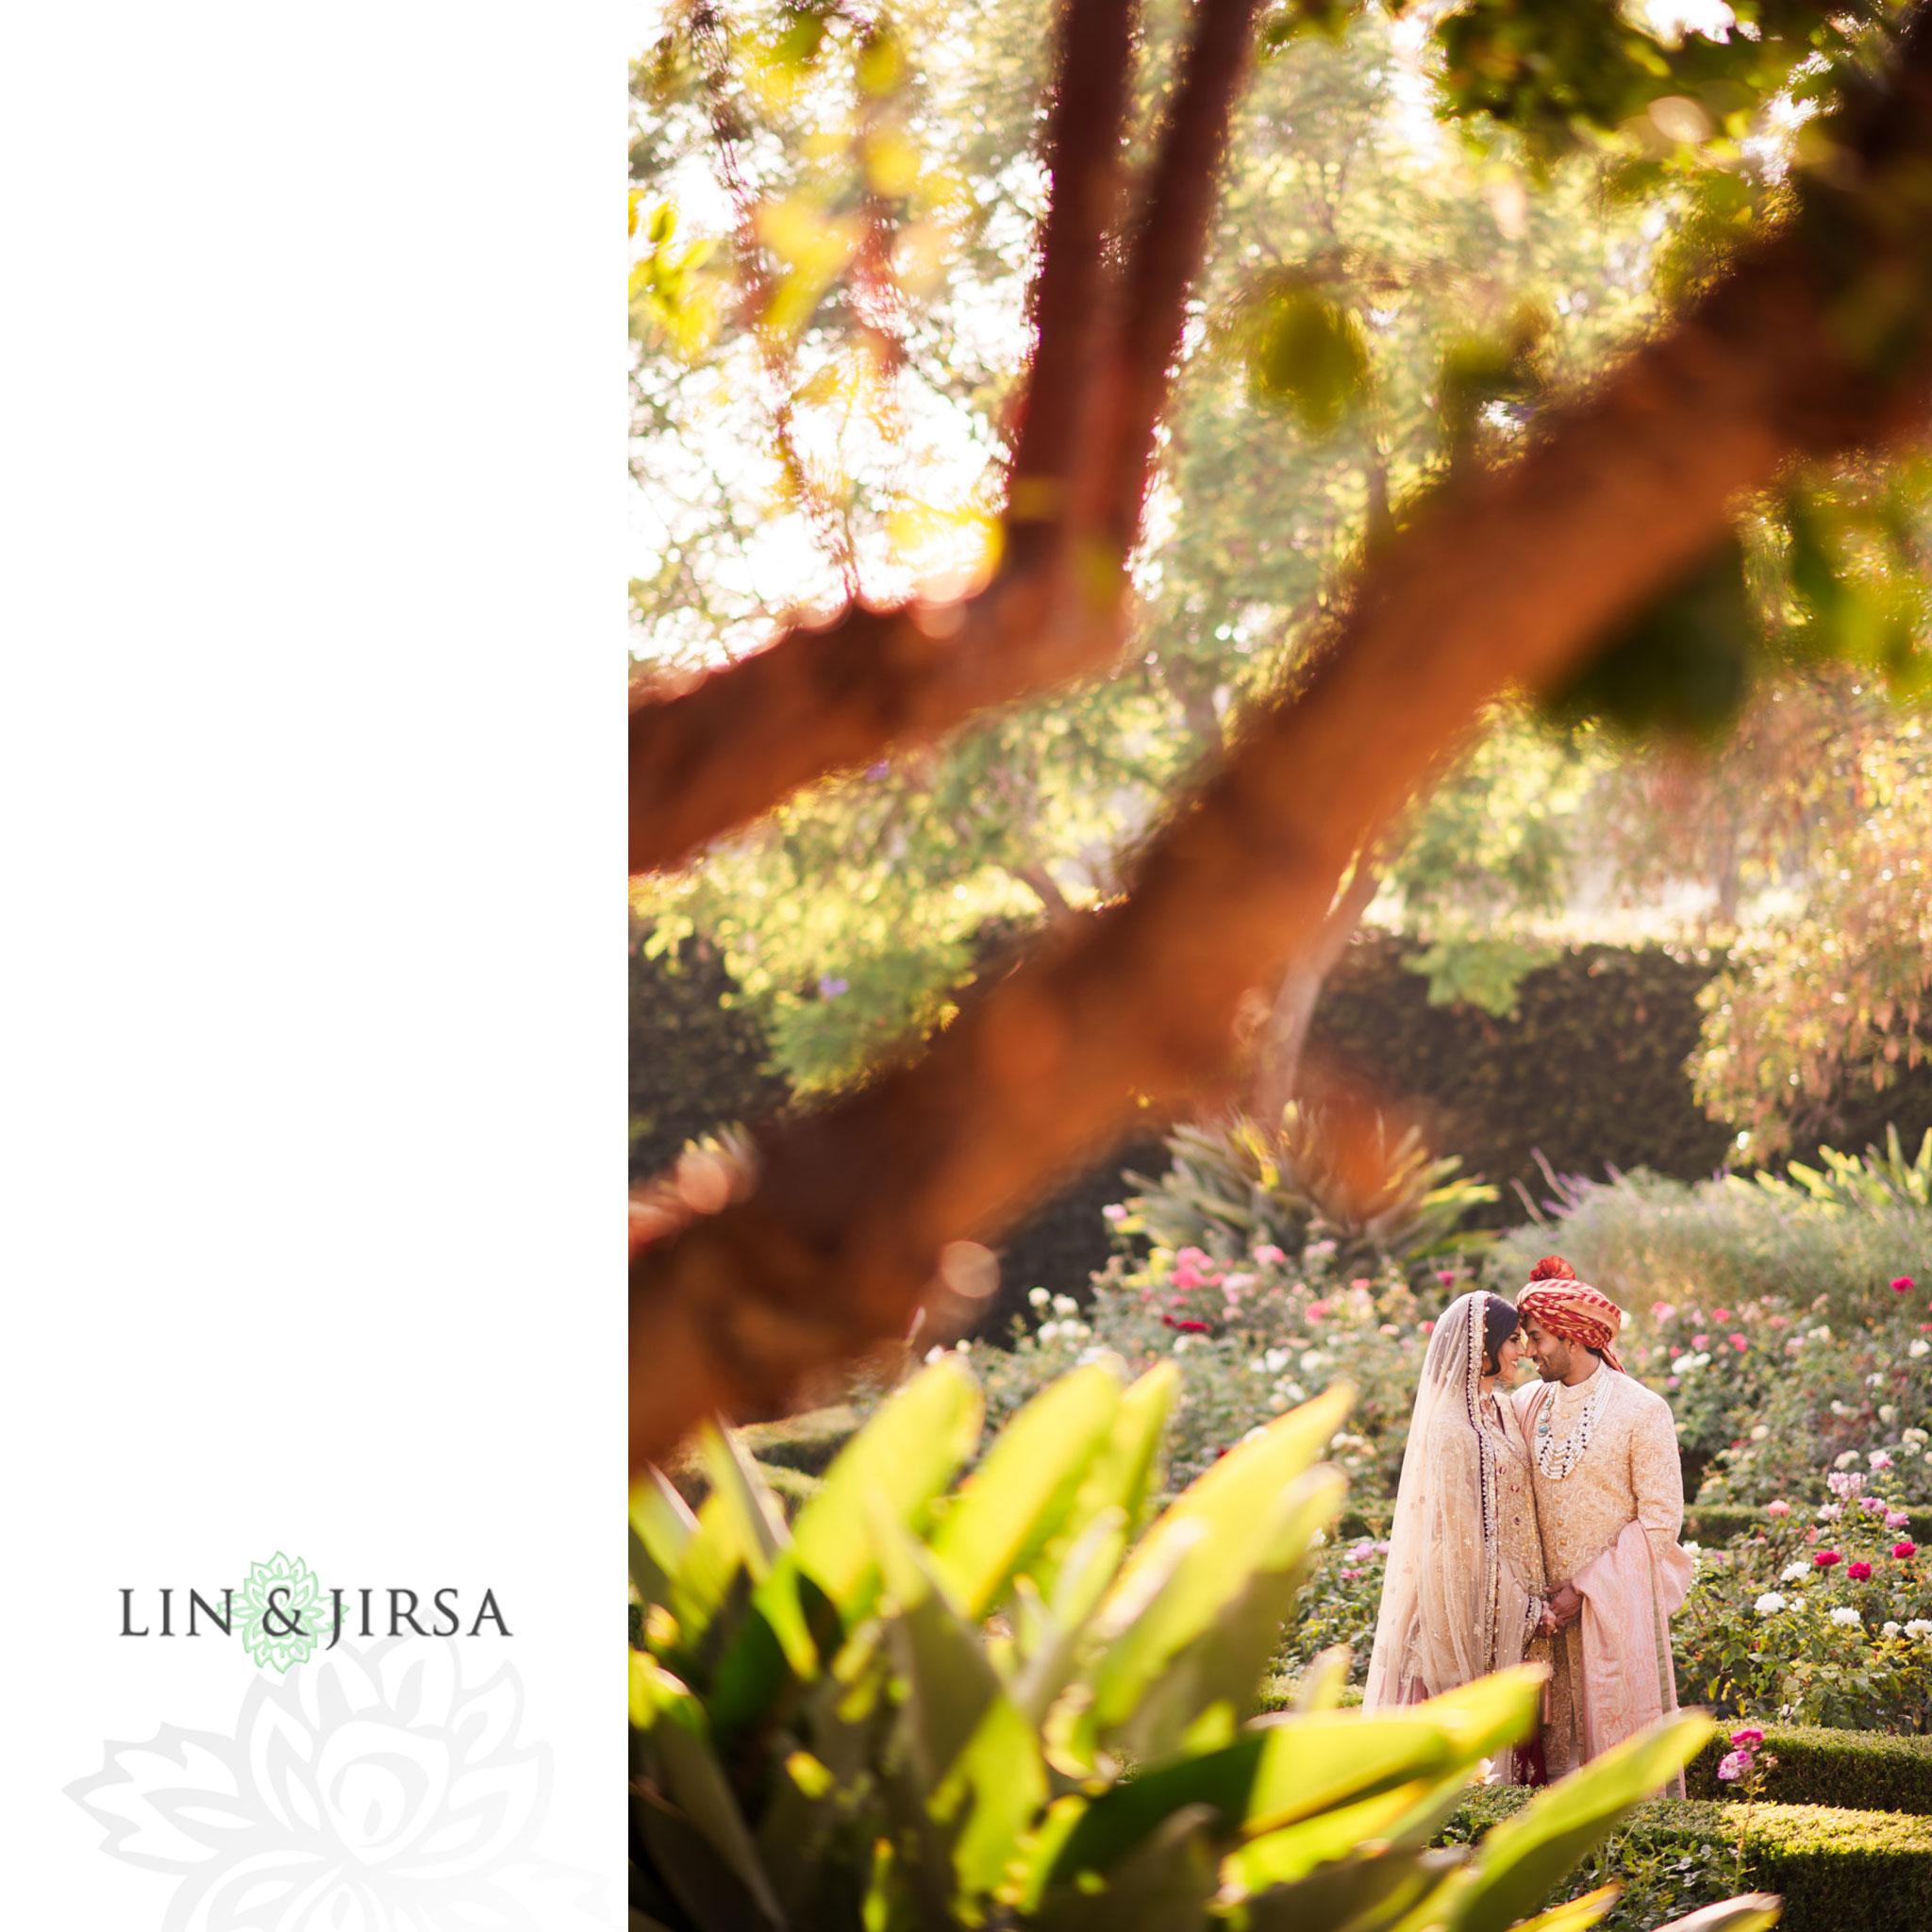 015 four seasons westlake village muslim wedding photography